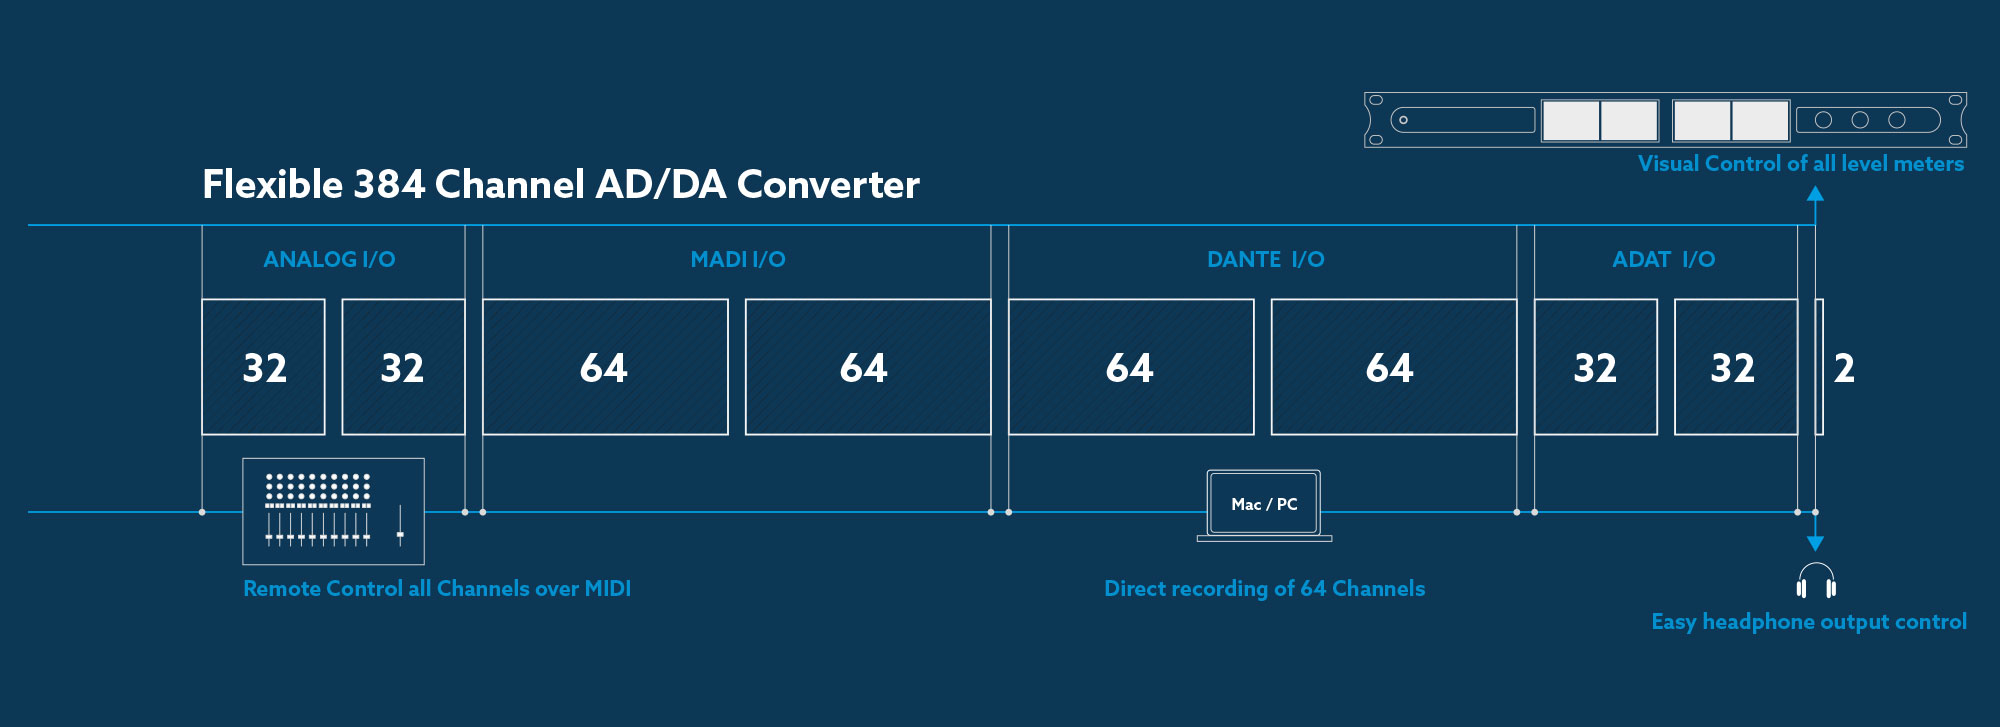 Ferrofish A32 Dante 64 Channel Ad Da Converter With Adat Madi And Circuitdiagram Addaconvertercircuit Adconverter 16bitad 384 Routing Matrix